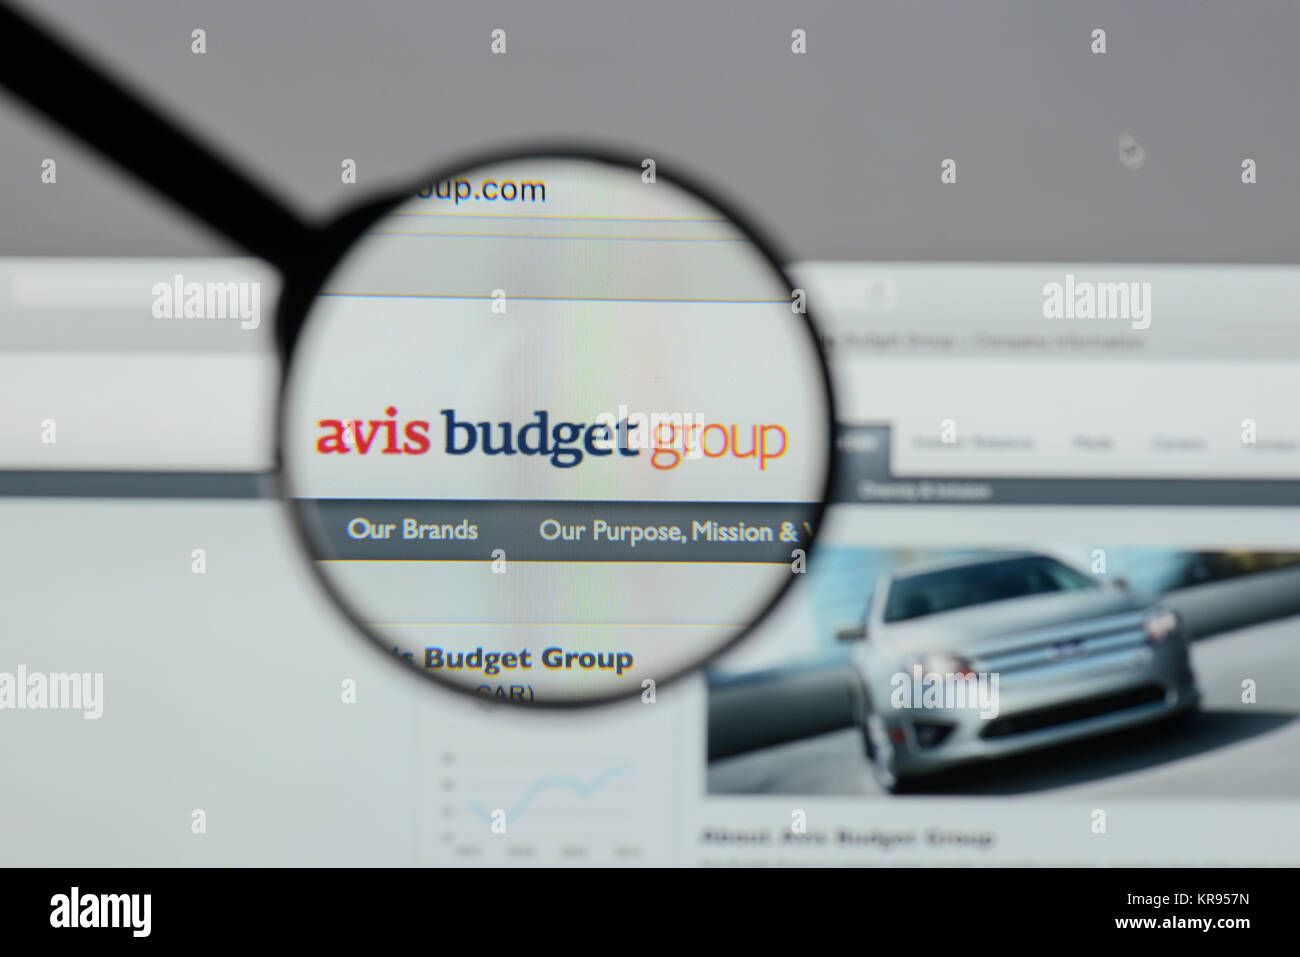 Sofia Italian Design Avis avis logo stock photos & avis logo stock images - alamy